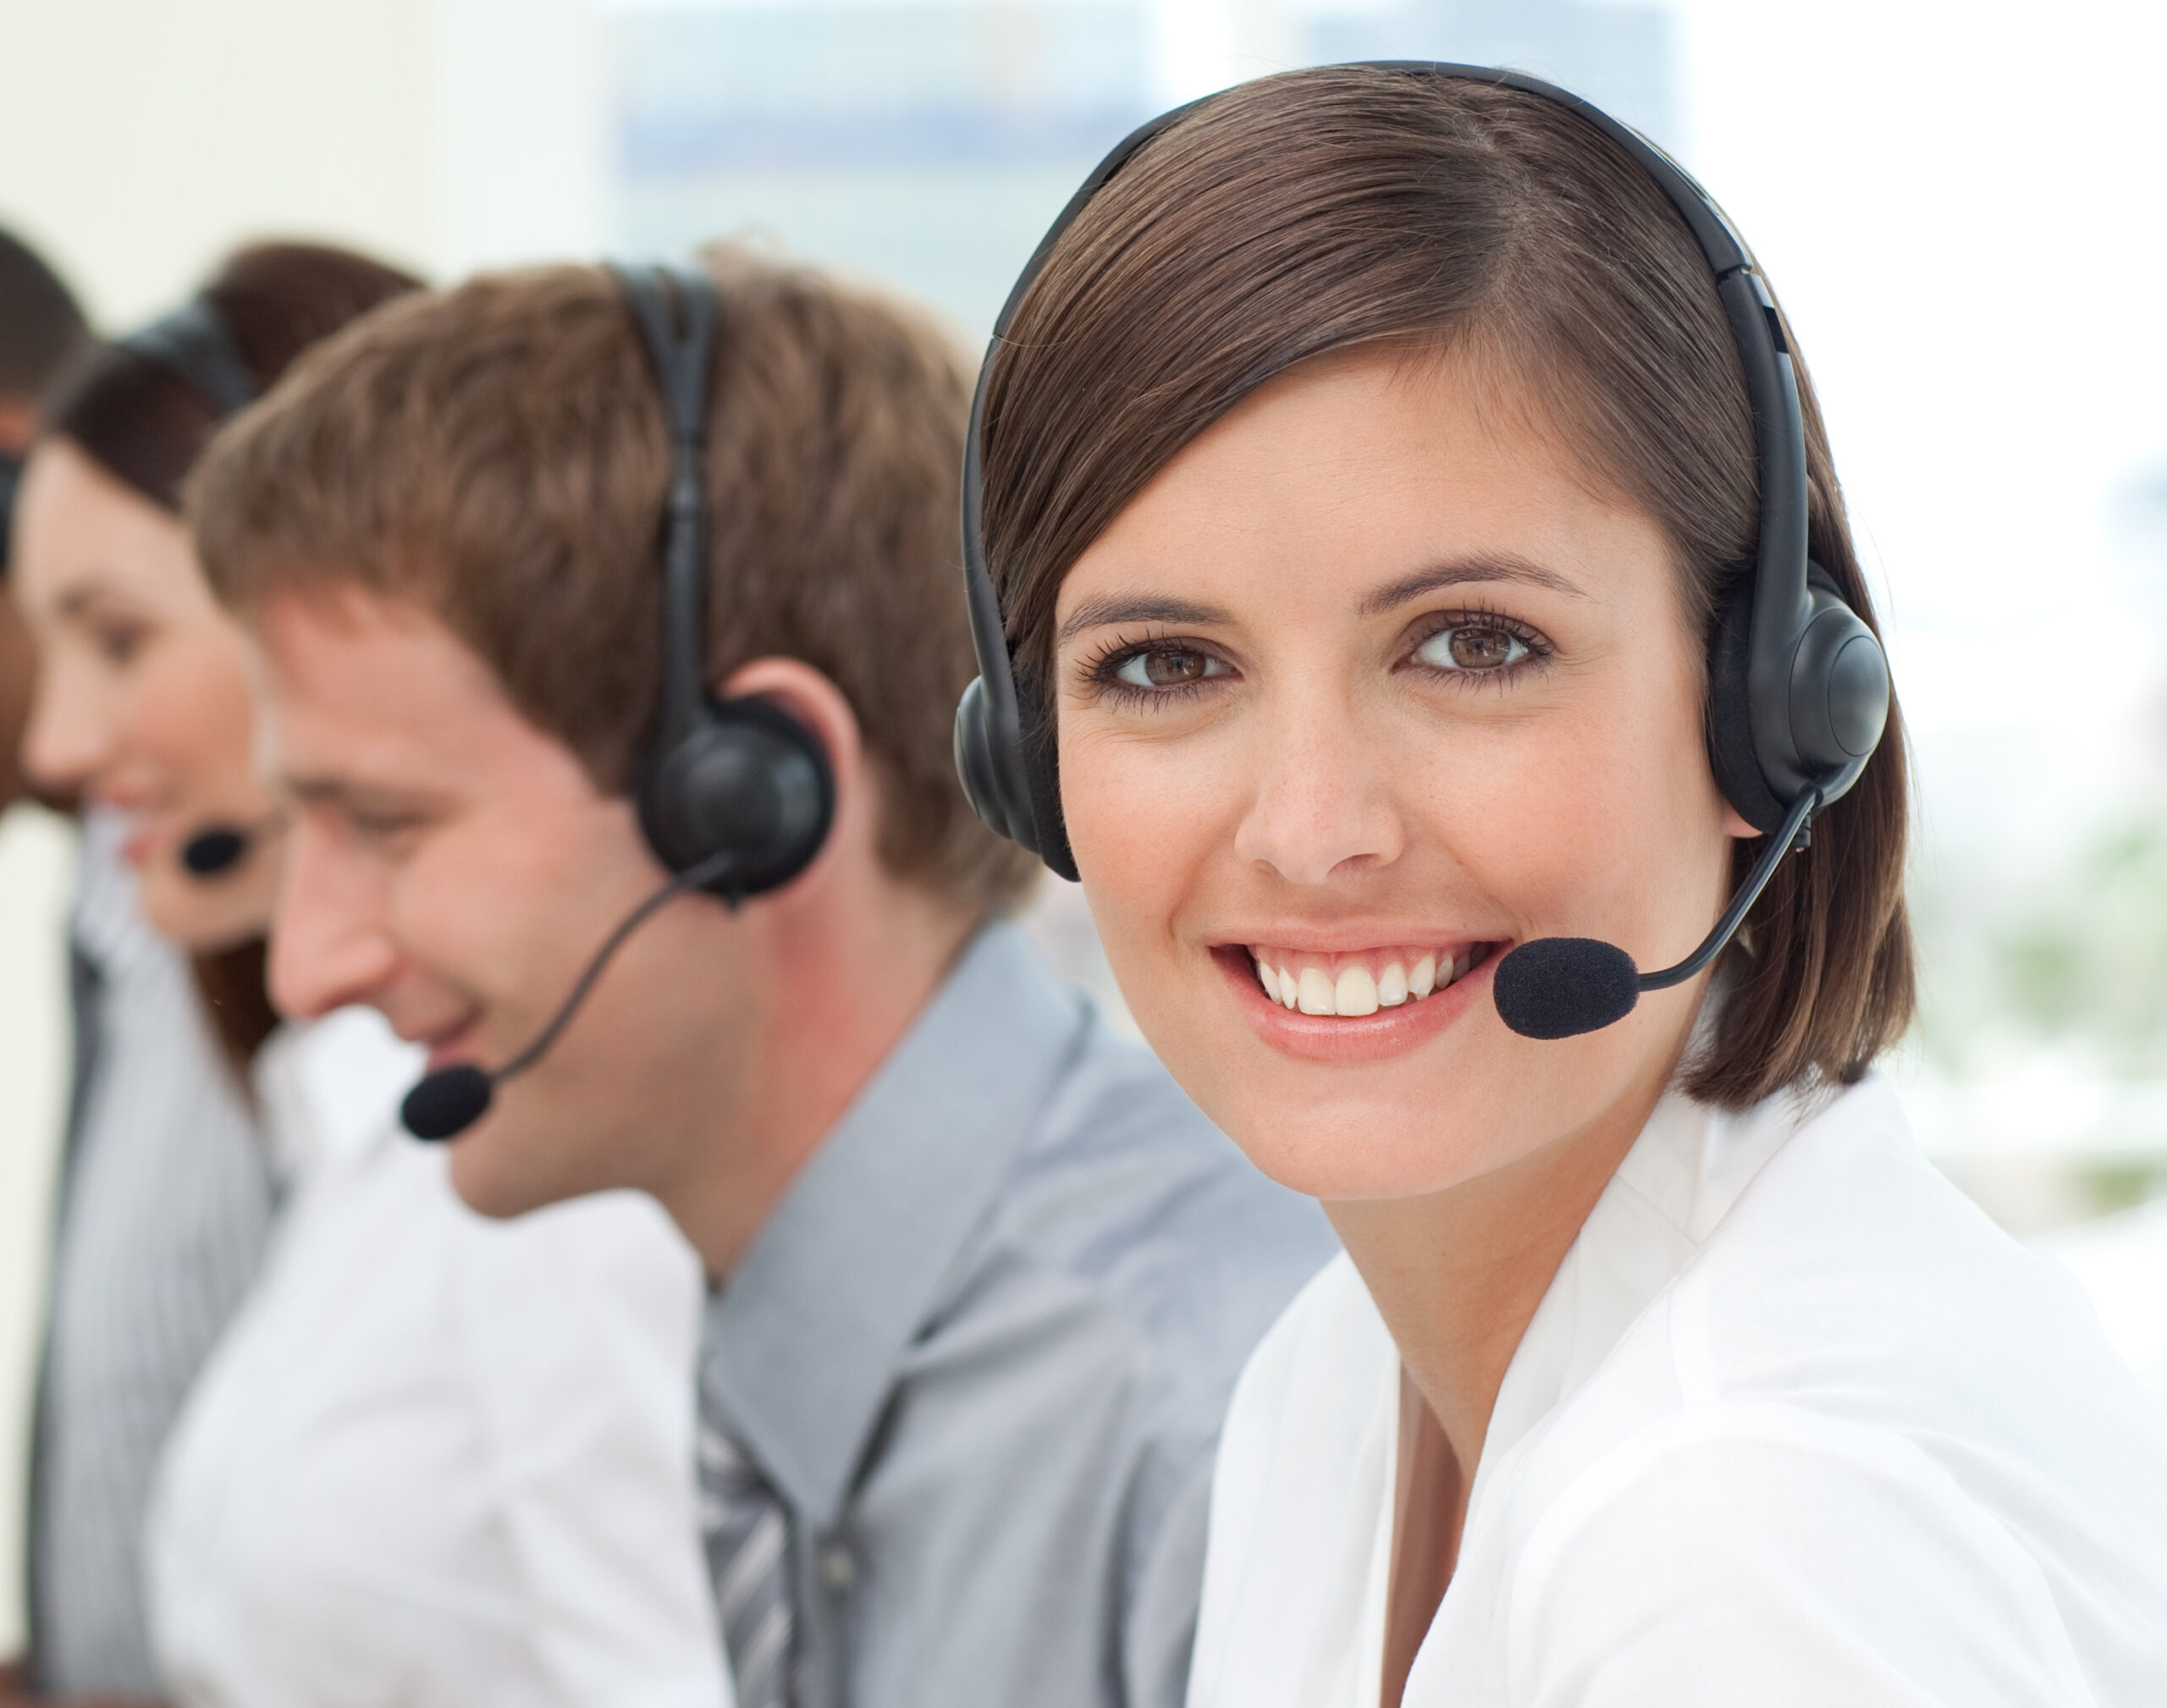 4 Ways to Improve Call Center Customer Service